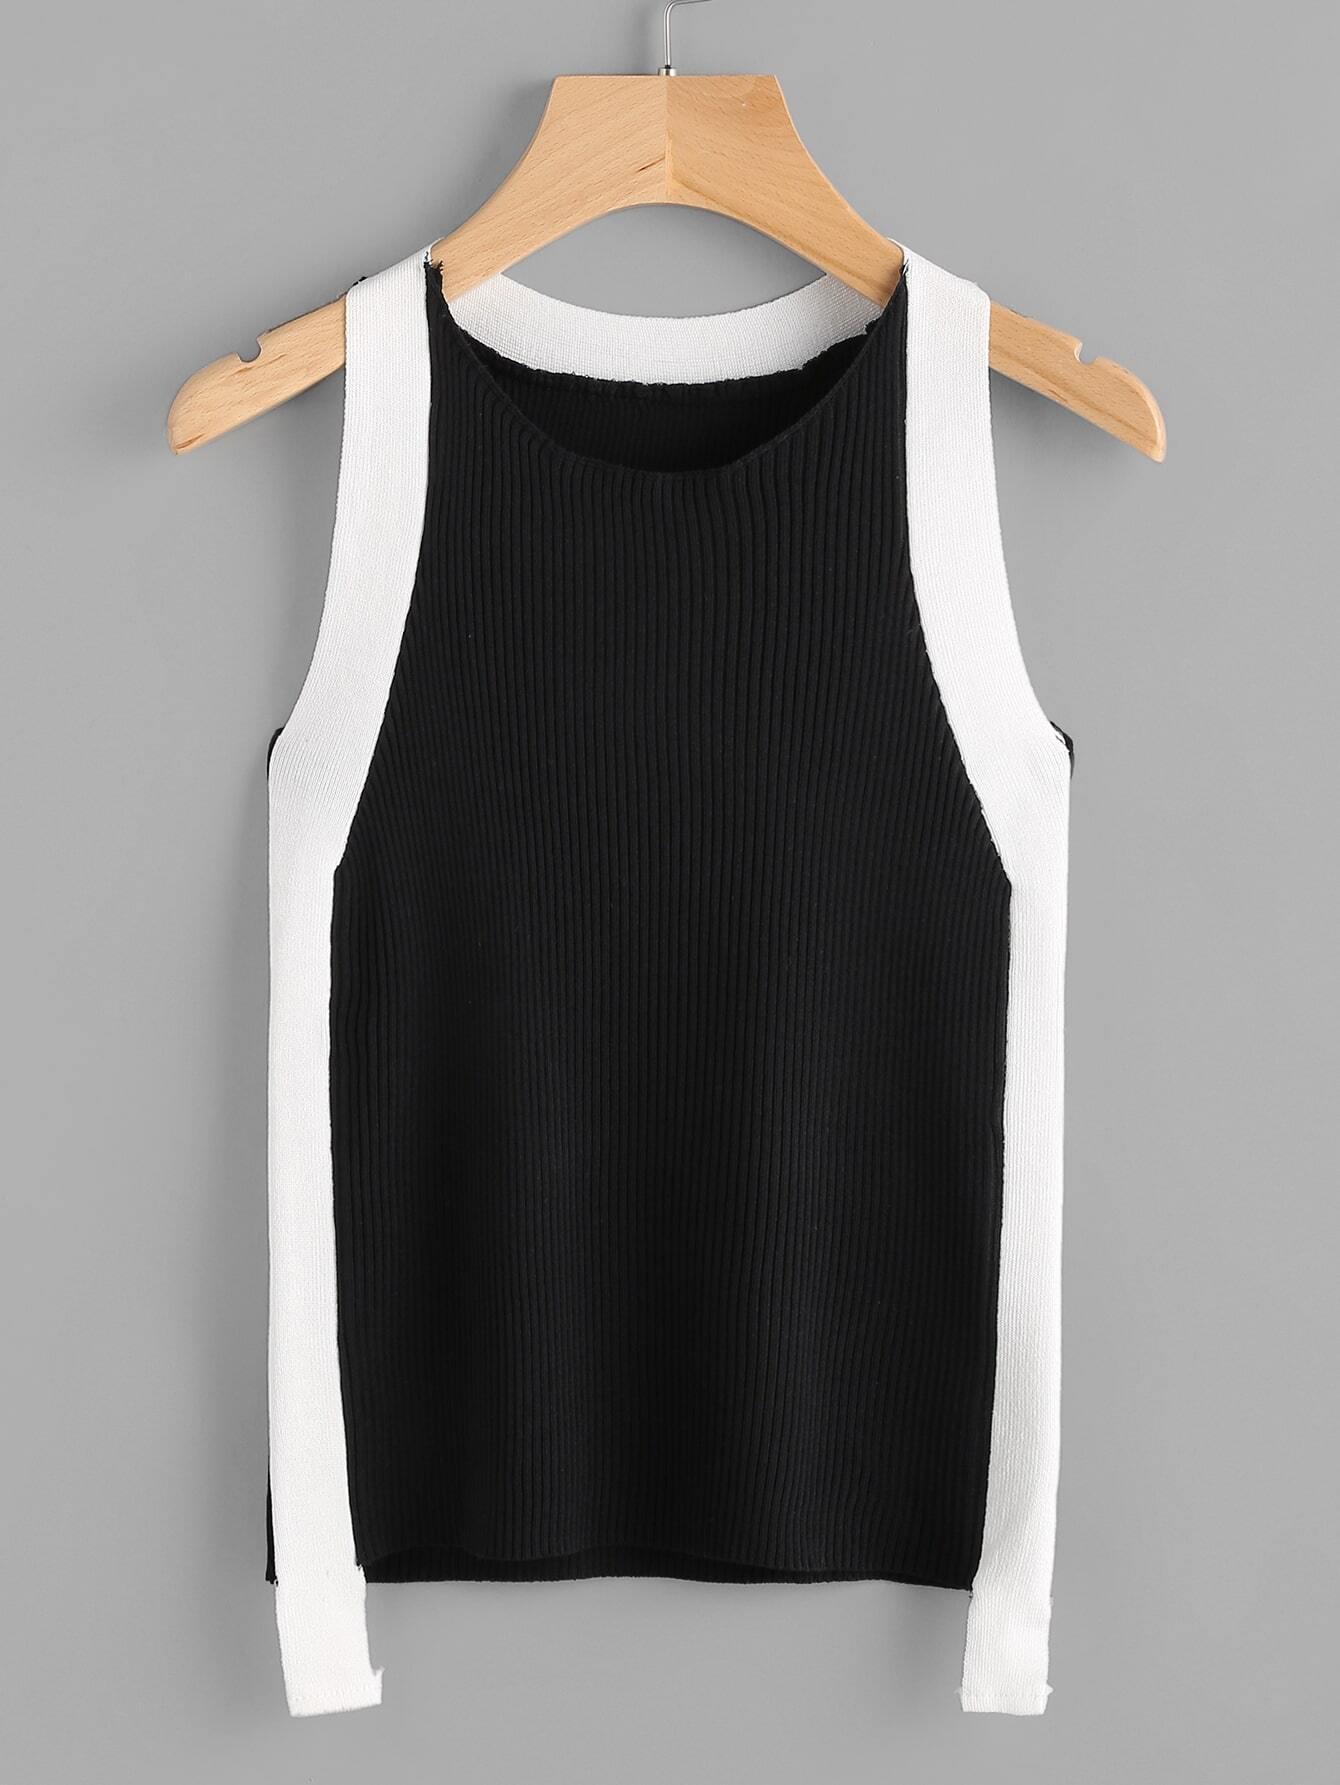 Contrast Panel Rib Knit Tank Top vest170509450